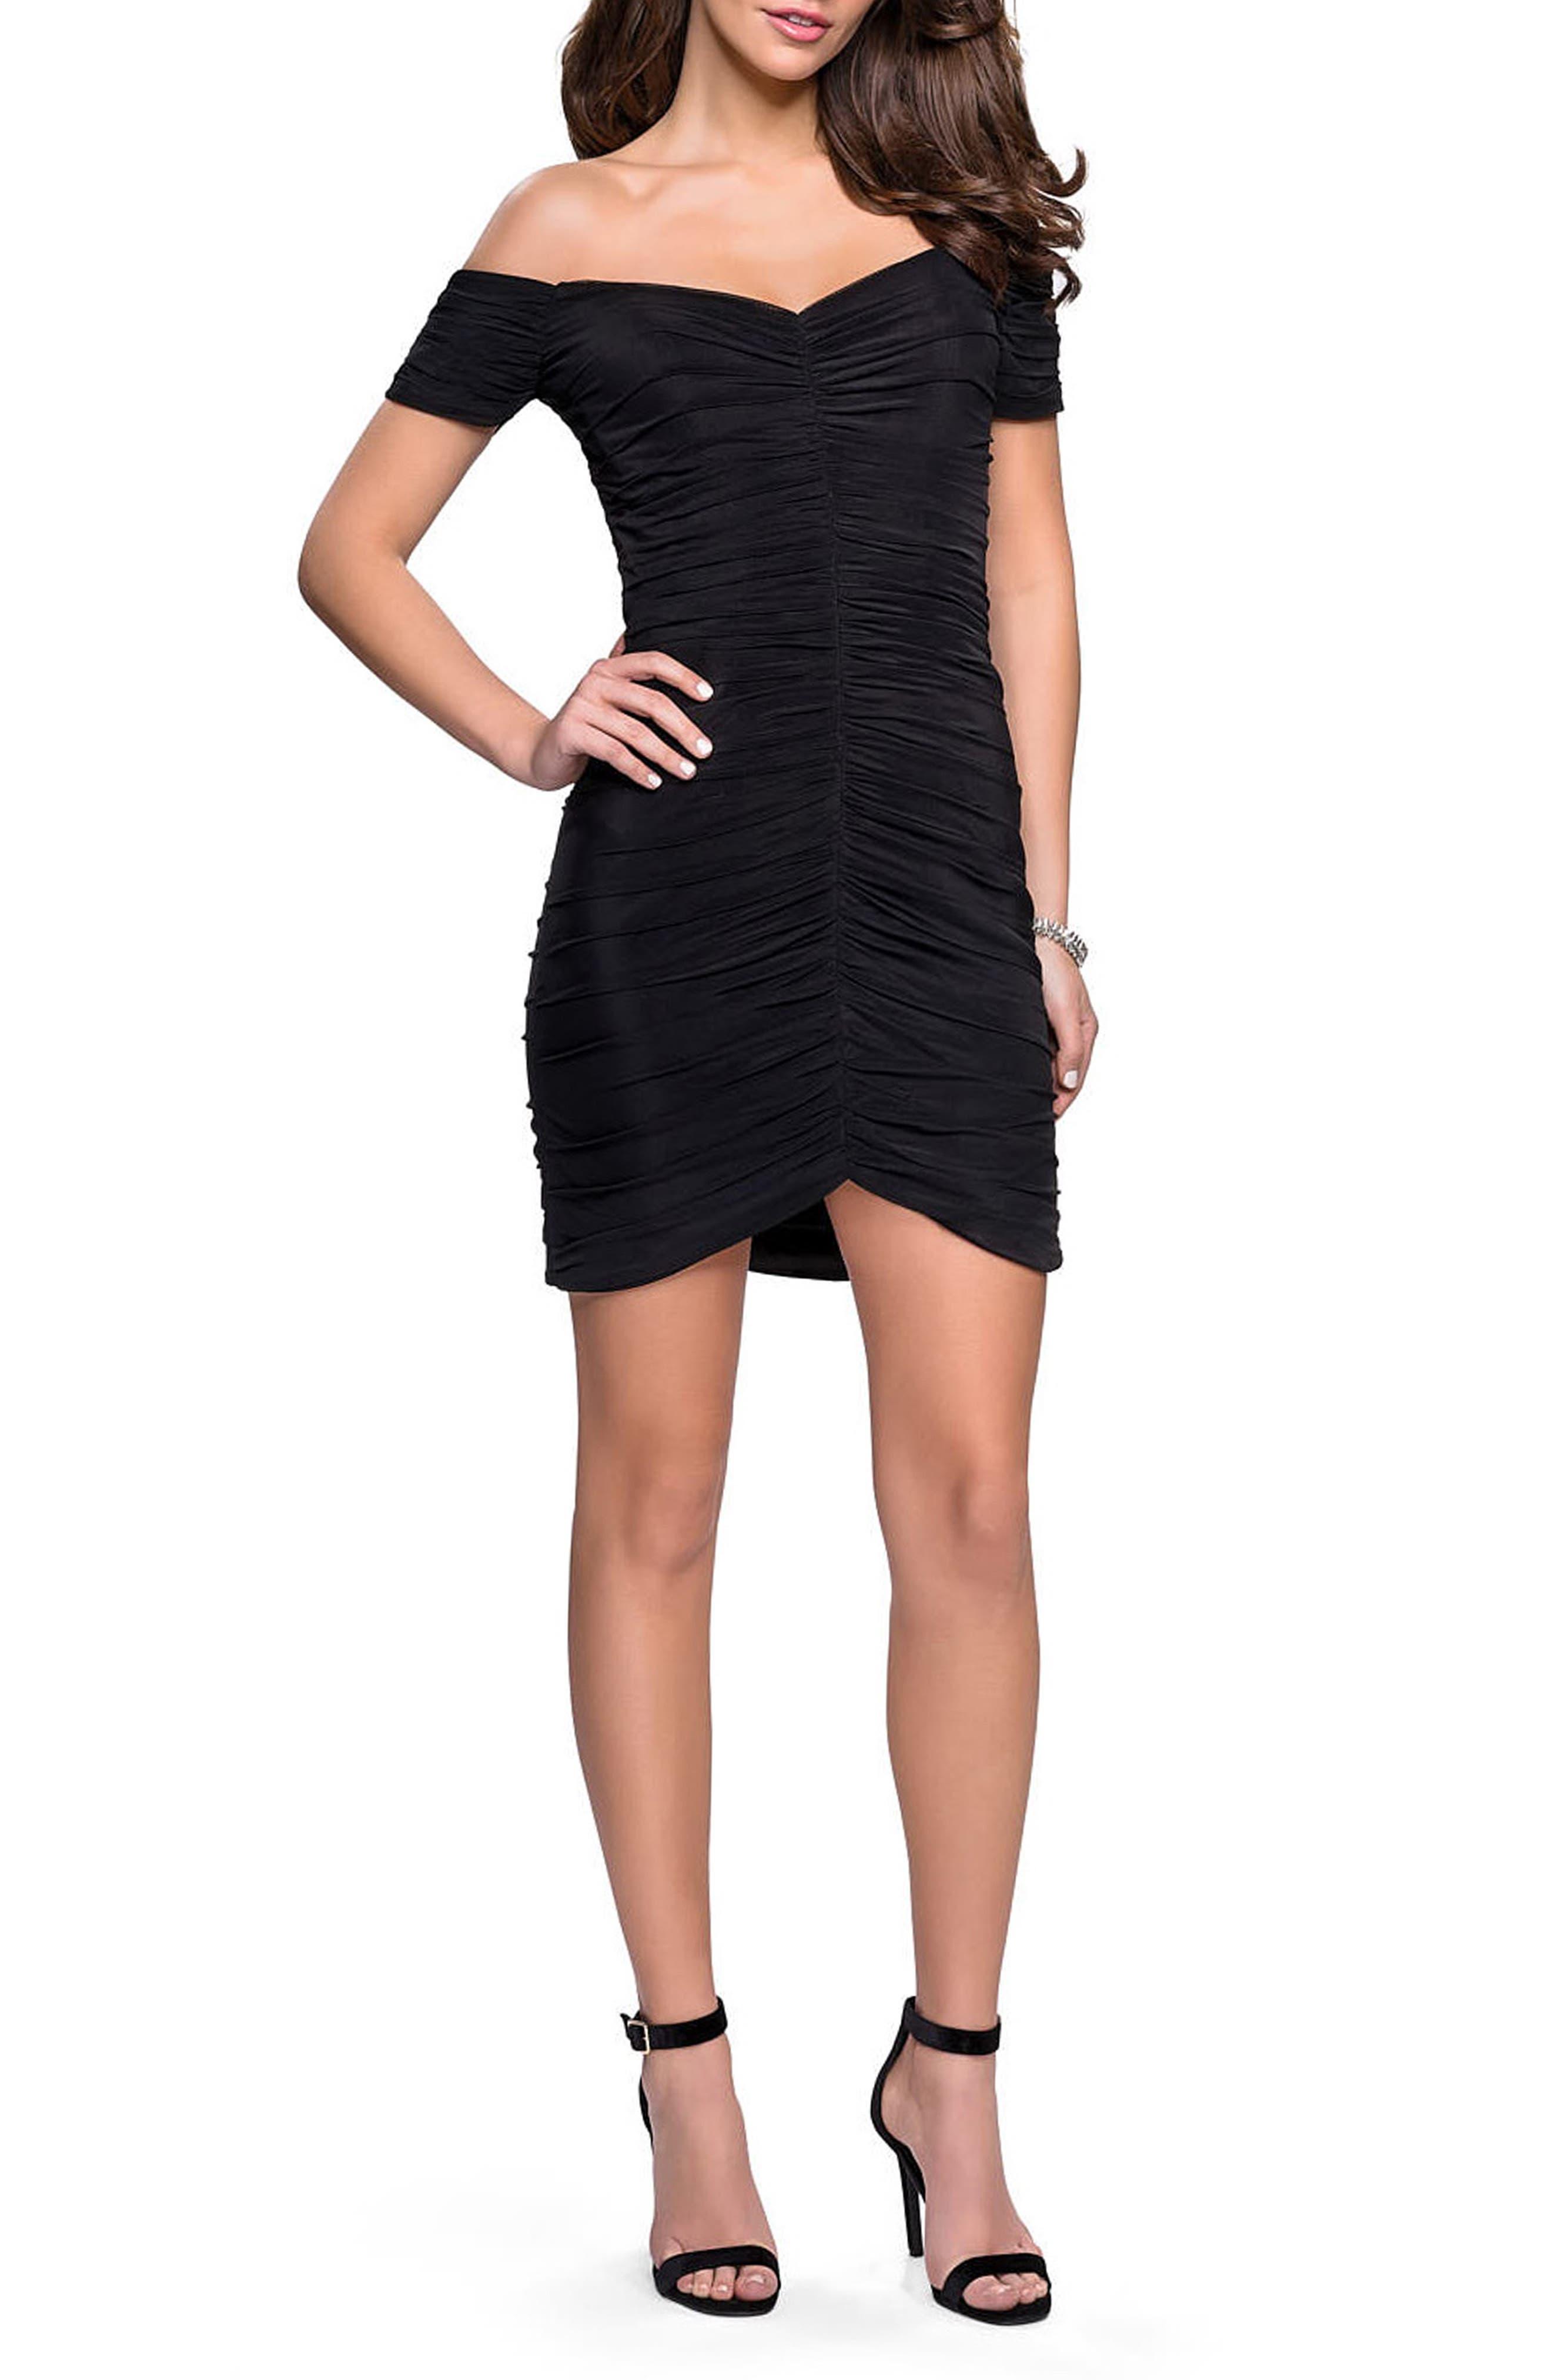 La Femme Off The Shoulder Ruched Party Dress